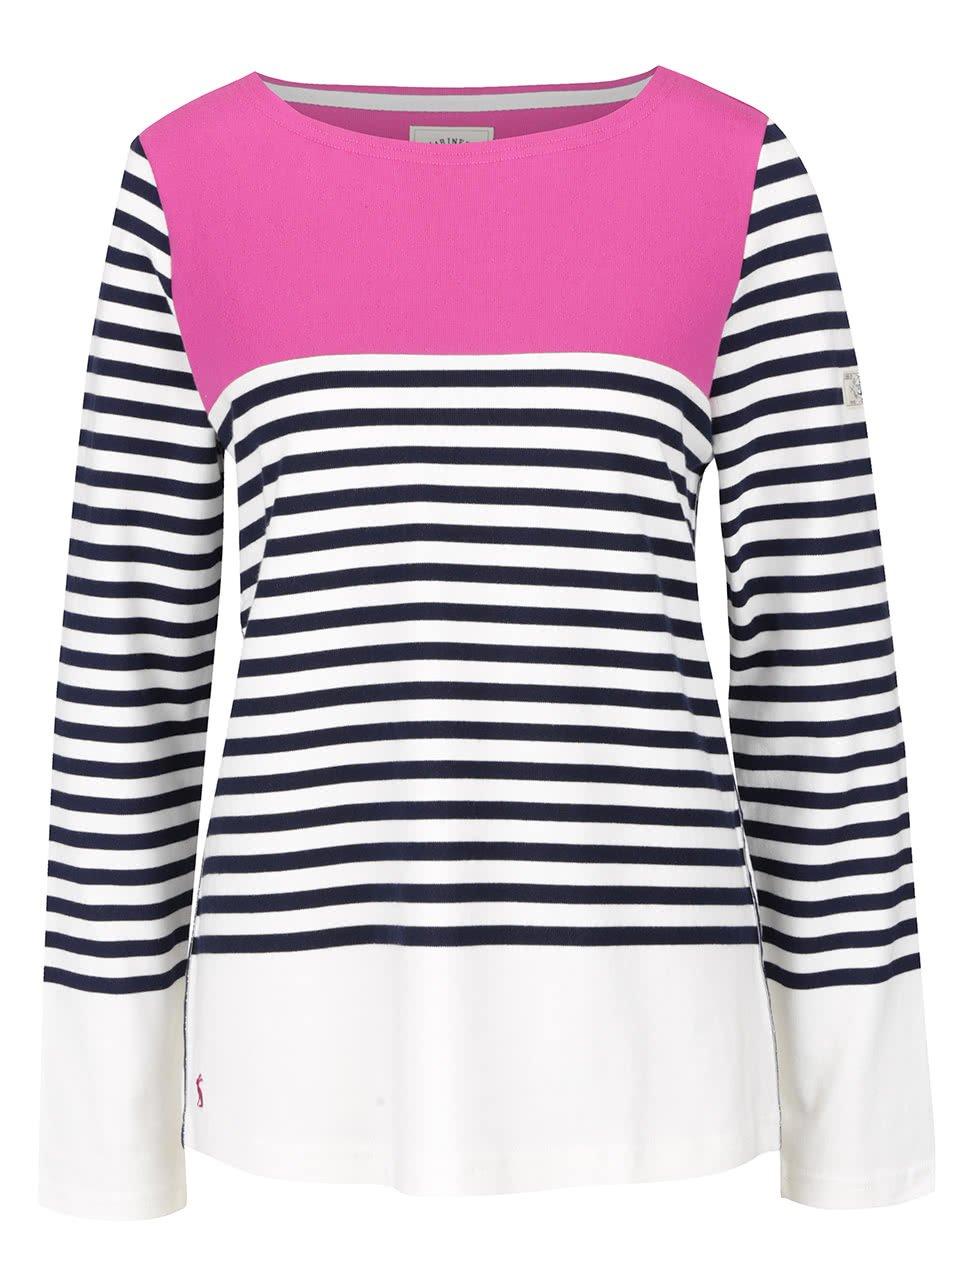 Růžovo-krémové dámské pruhované tričko s dlouhým rukávem Tom Joule Harbour